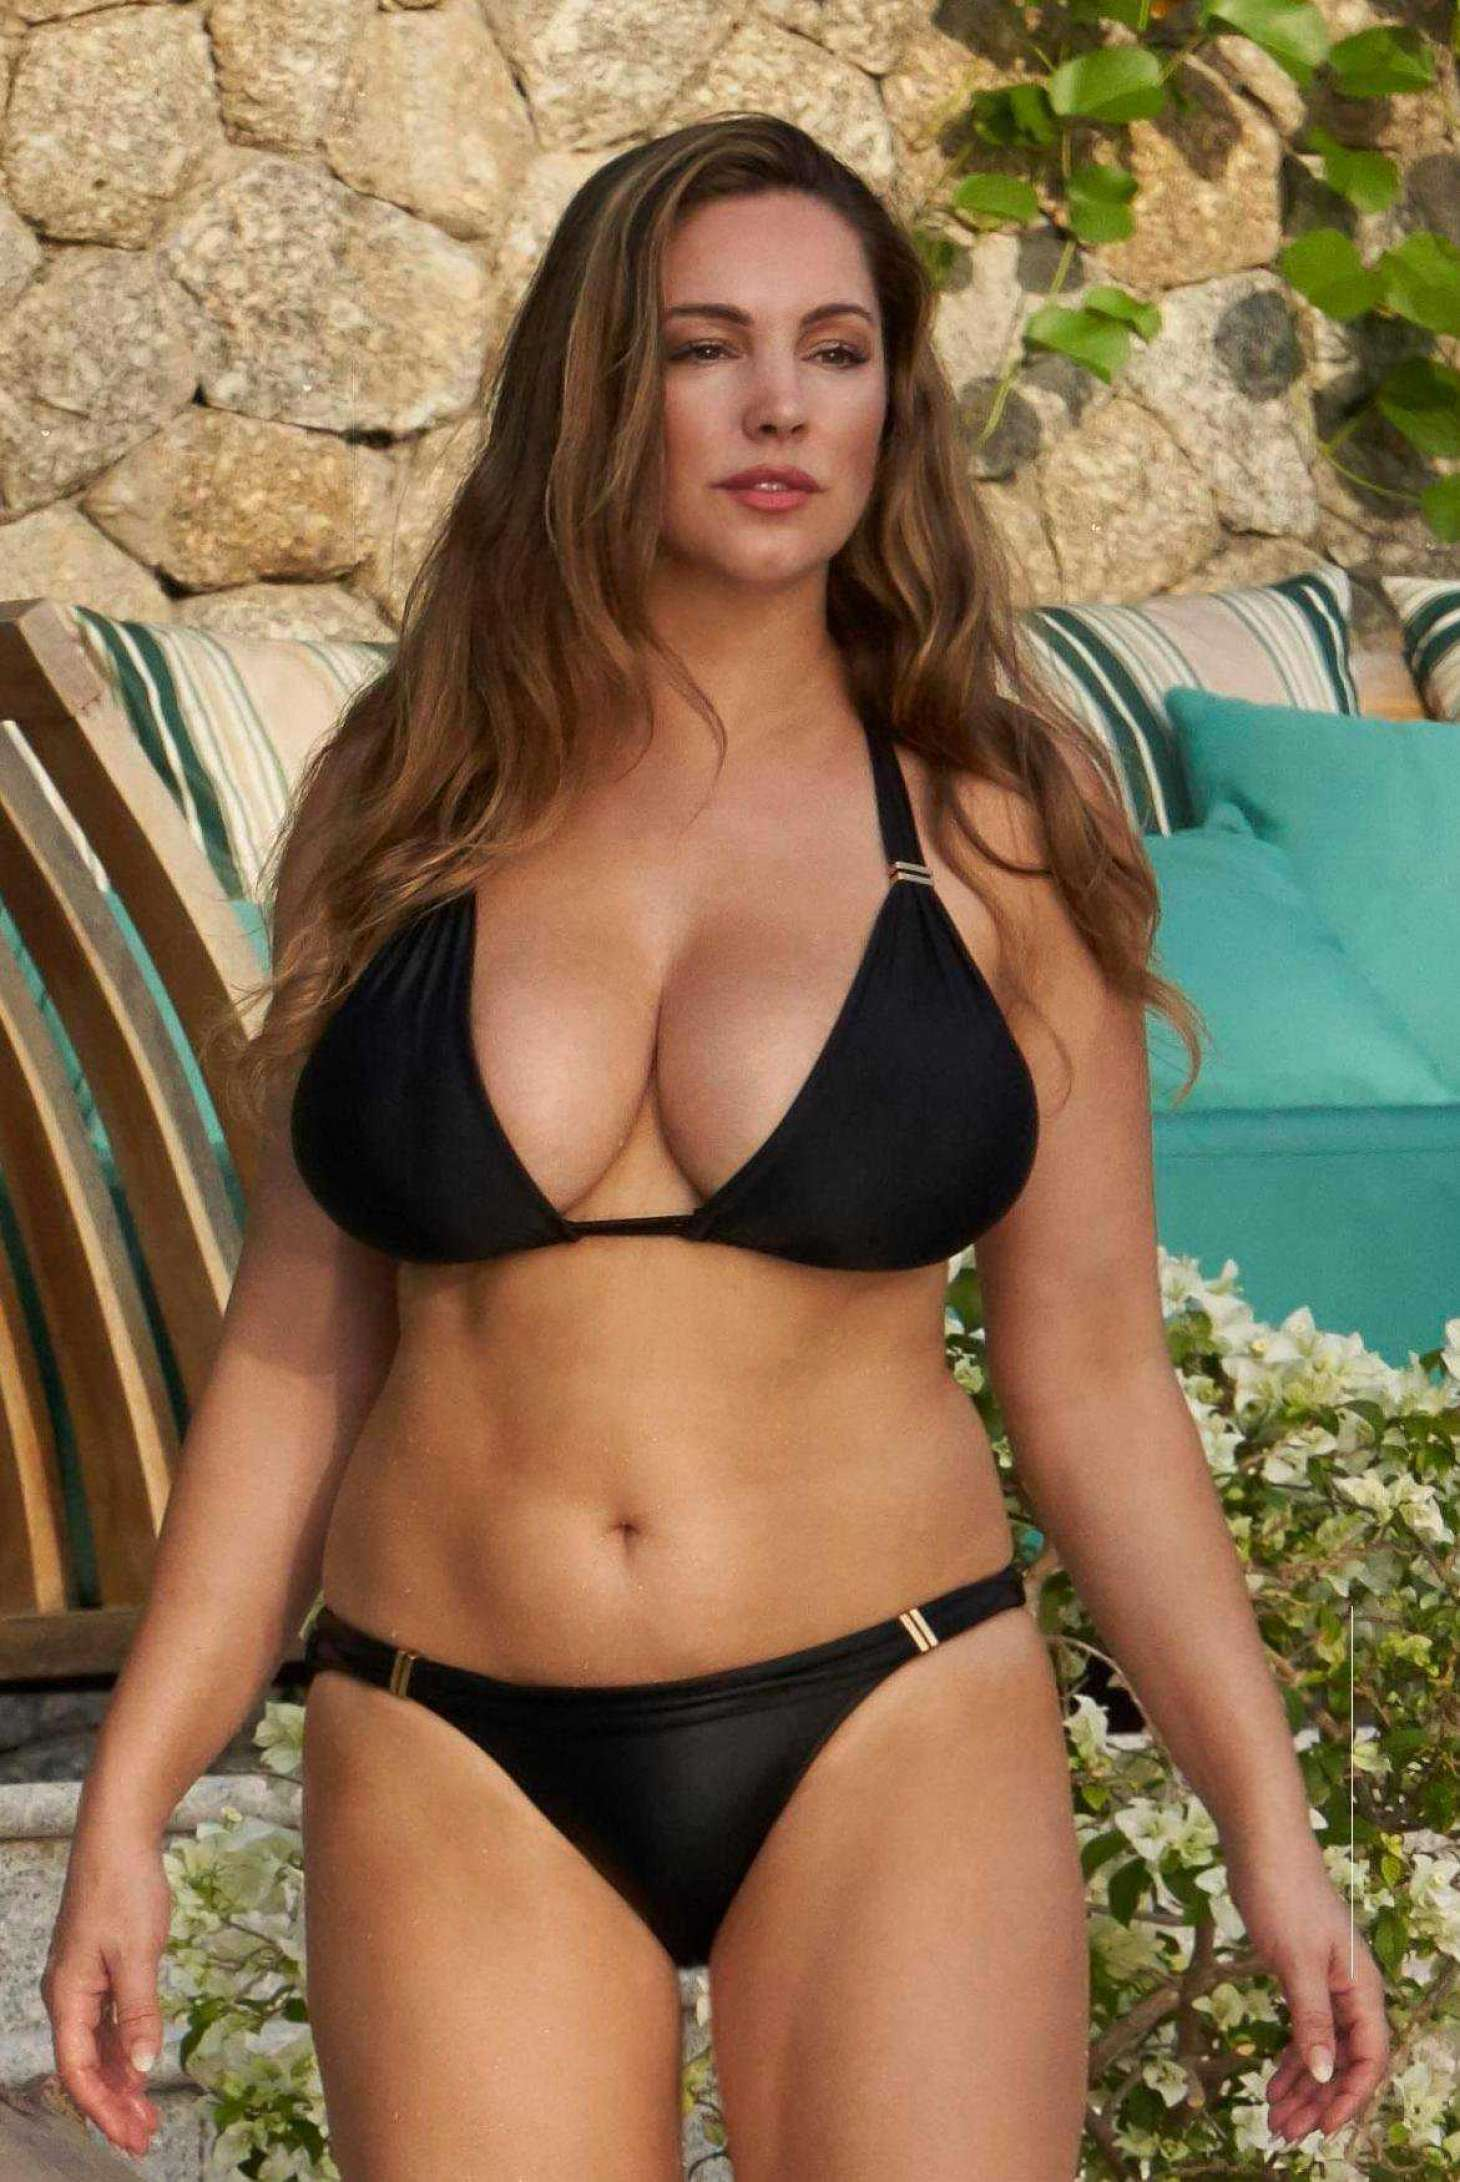 Kelly Brook in Black Bikini on the pool in Phuket adds